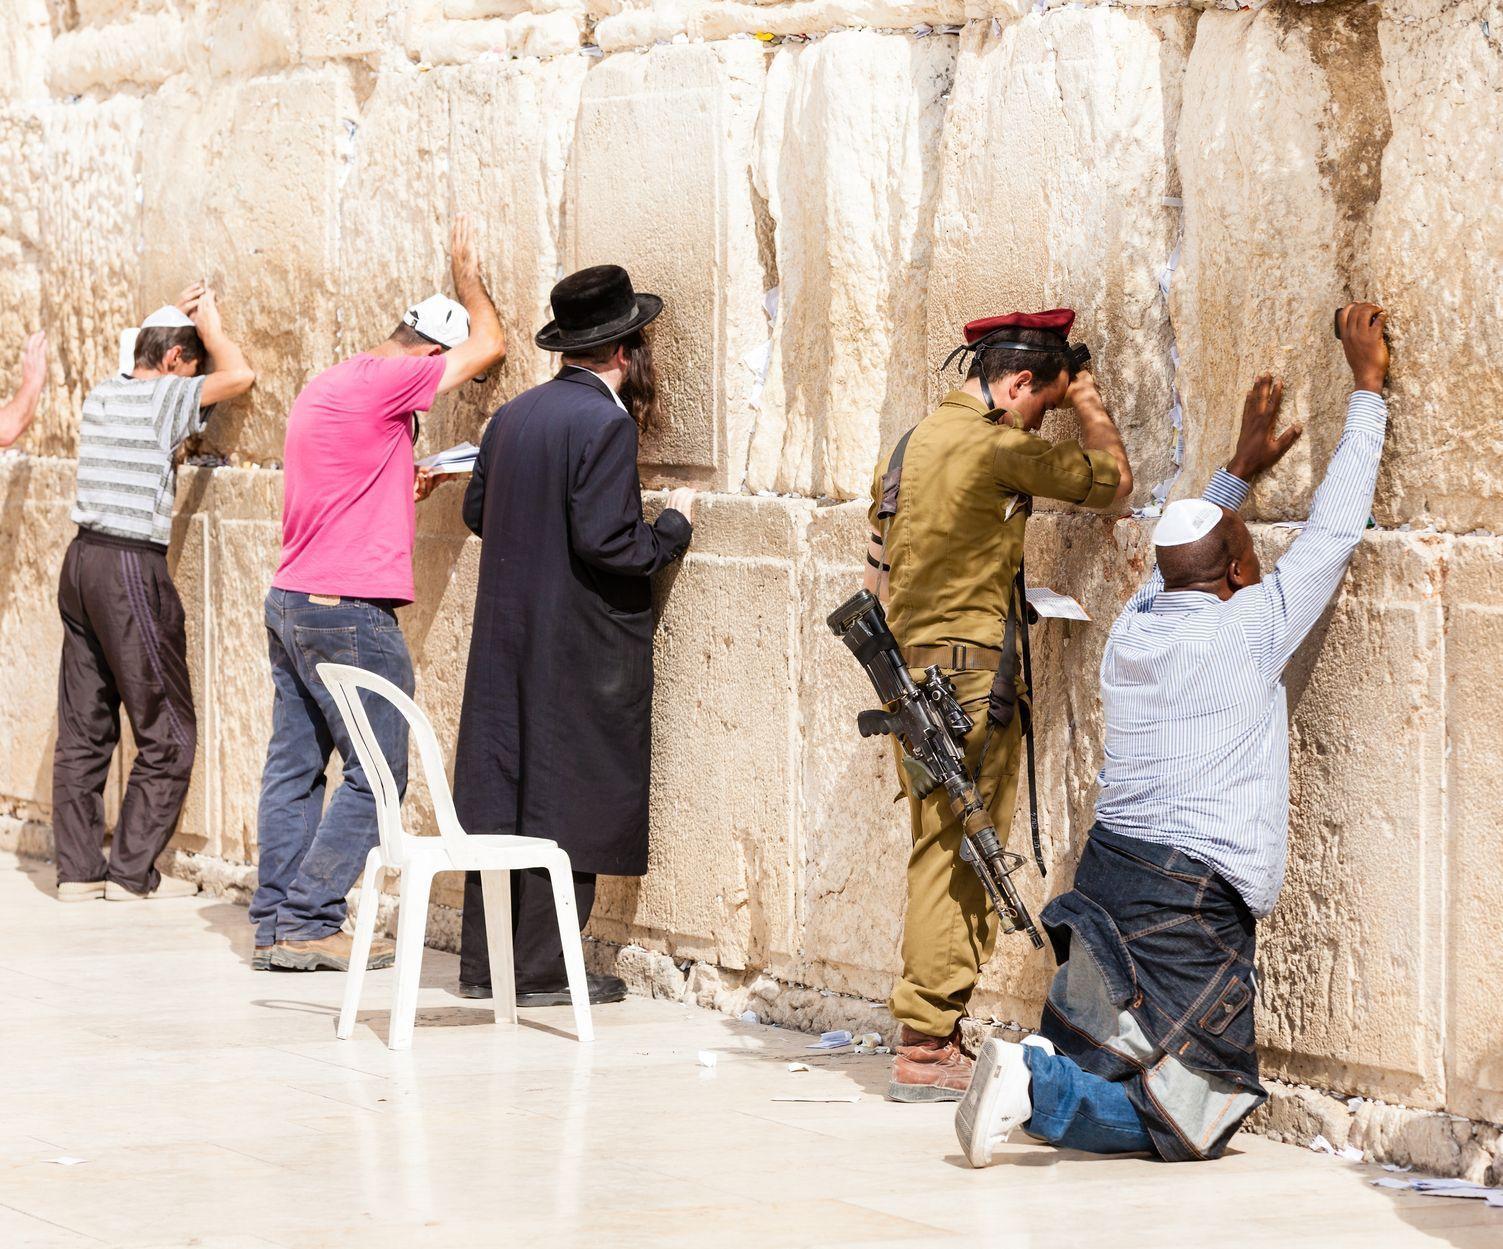 Men pray at the Western (Wailing) Wall in Jerusalem.